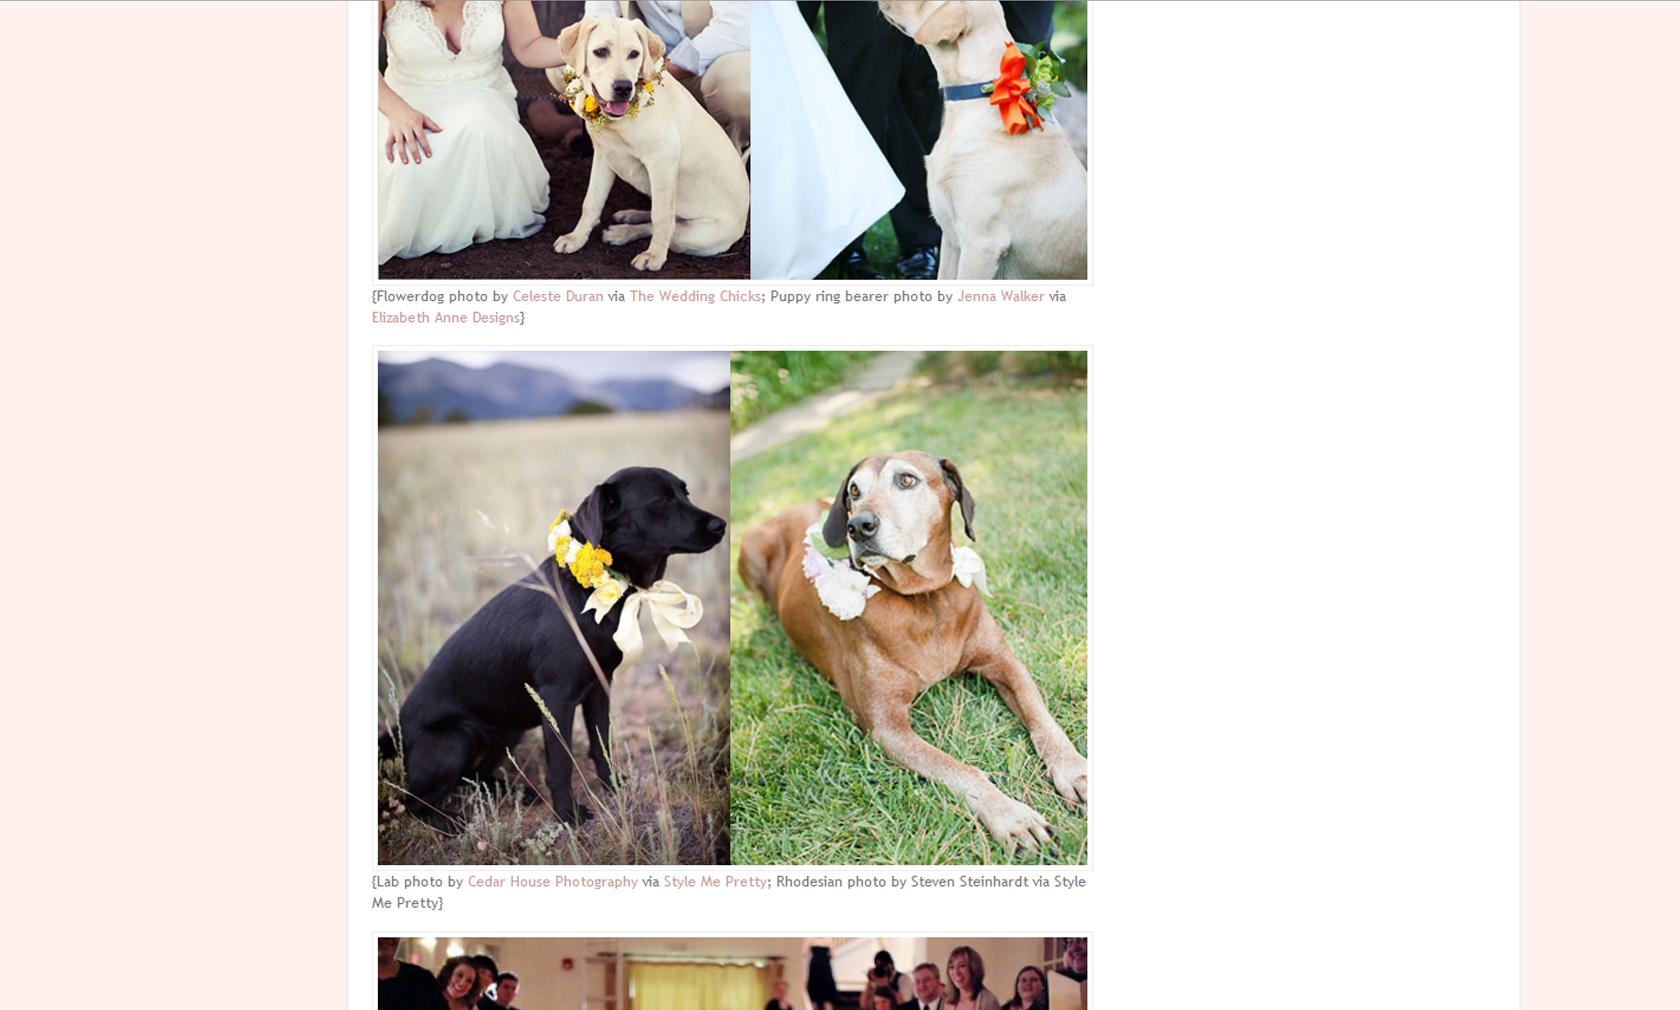 nathrop wedding photographer, colorado wedding photographer, dogs at weddings